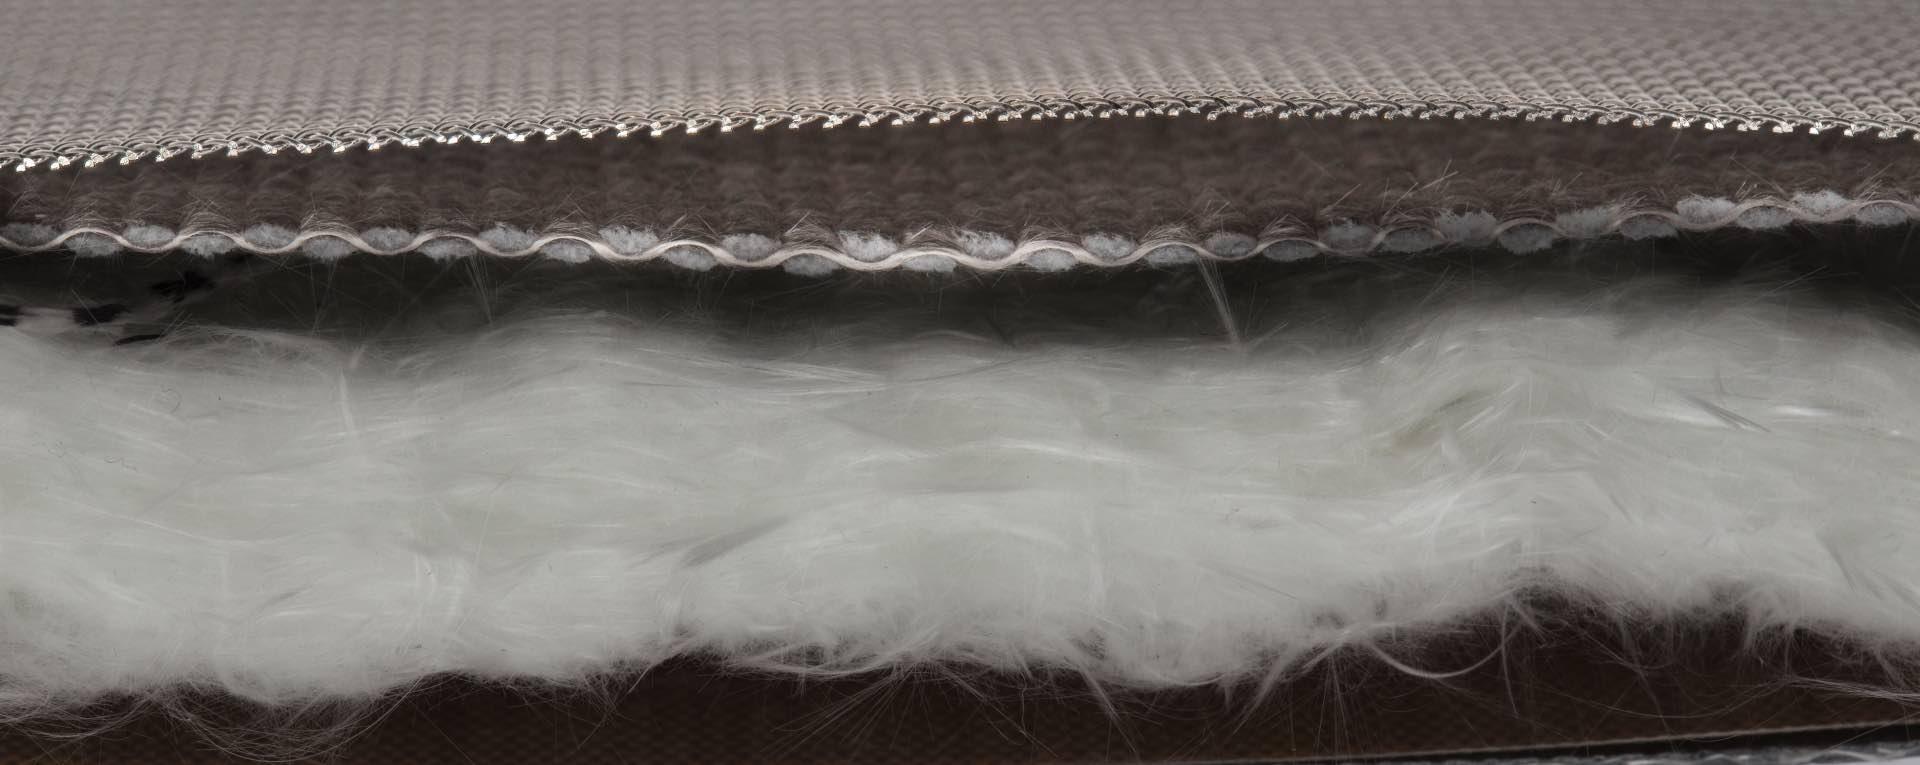 juntas expansion compensadores dilatacion textiles